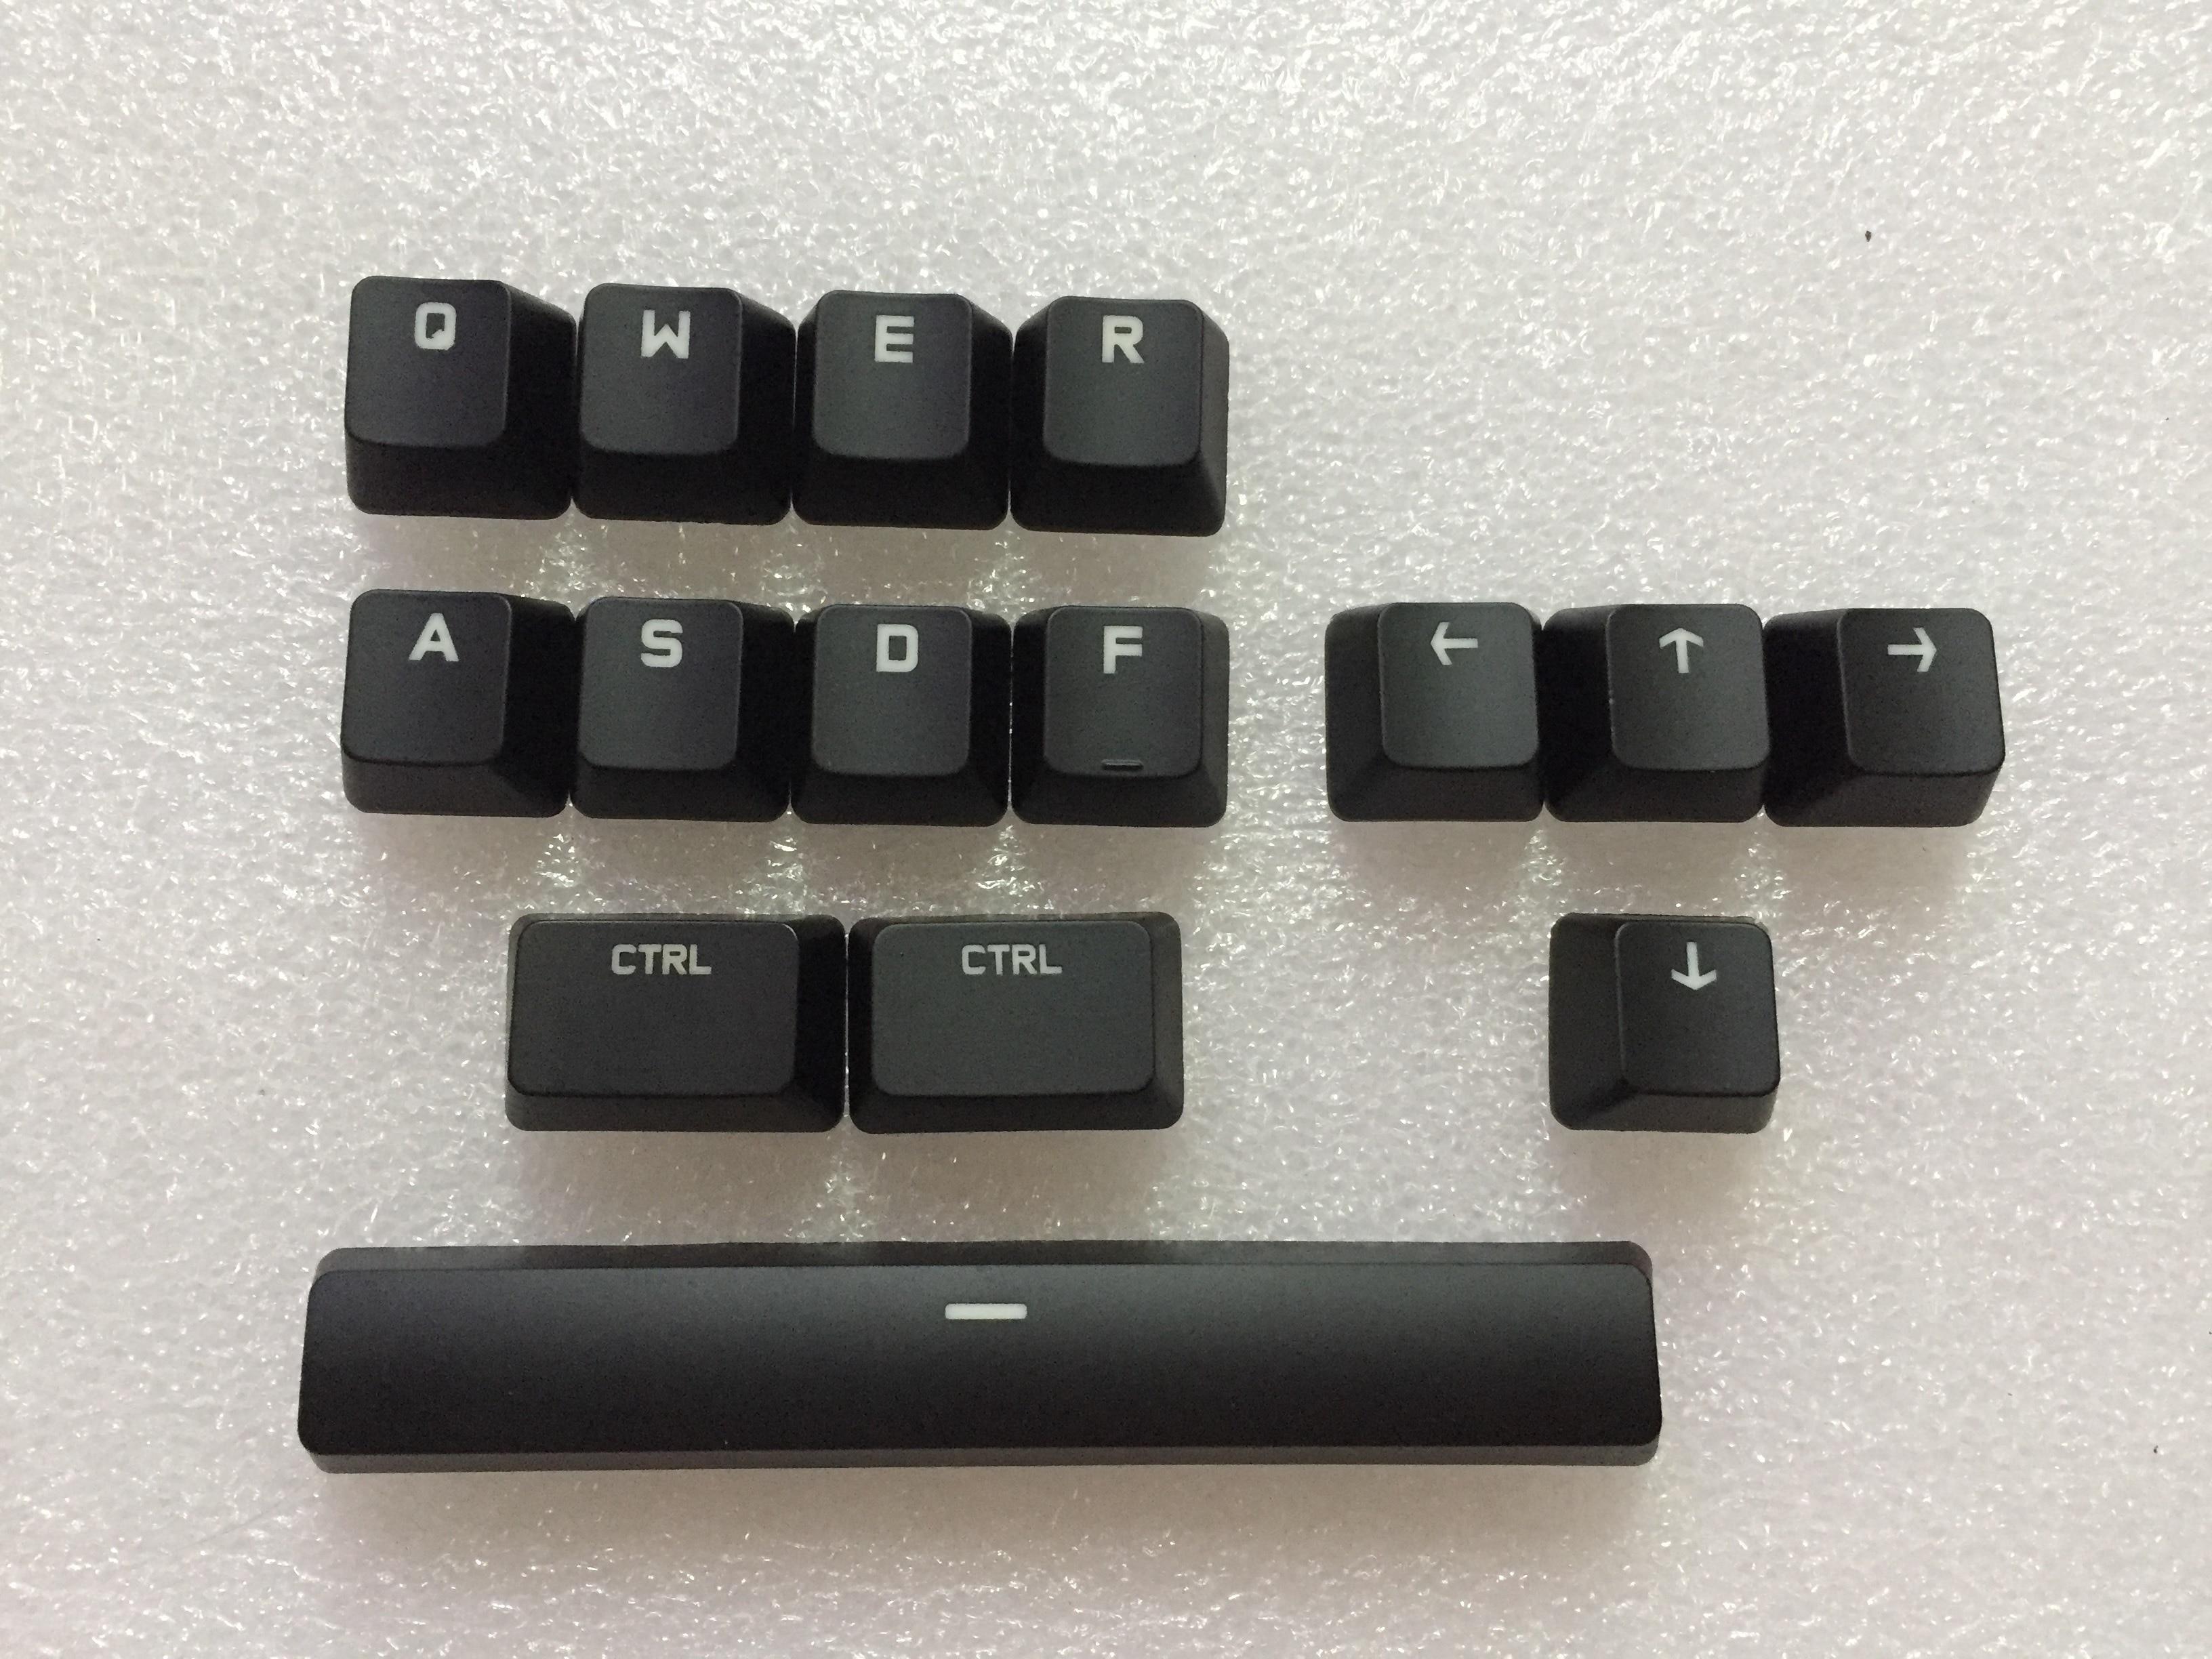 Tapas de teclas originales CTRL ALT TAB SPACE SHIFT para teclado mecánico logitech G610 tapa de llave con tirador de tapa de llave gratis